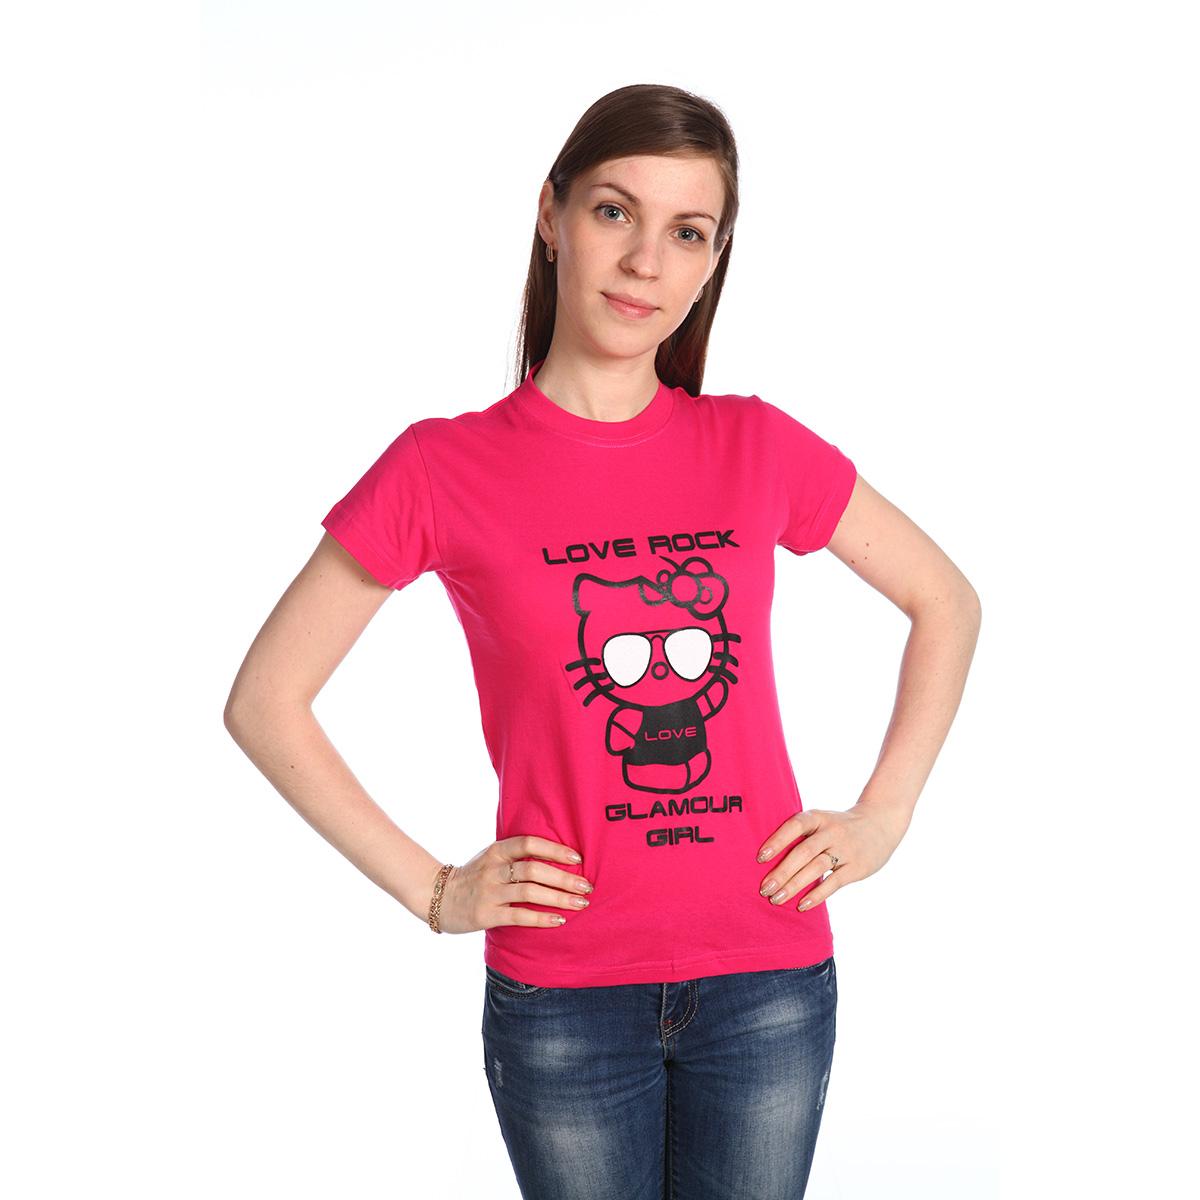 Женская футболка Glamour Girl Розовый, размер LБлузки, майки, кофты<br>Обхват груди:96 см<br>Обхват талии:77 см<br>Обхват бедер:104 см<br>Рост:164-170 см<br><br>Тип: Жен. футболка<br>Размер: L<br>Материал: Кулирка